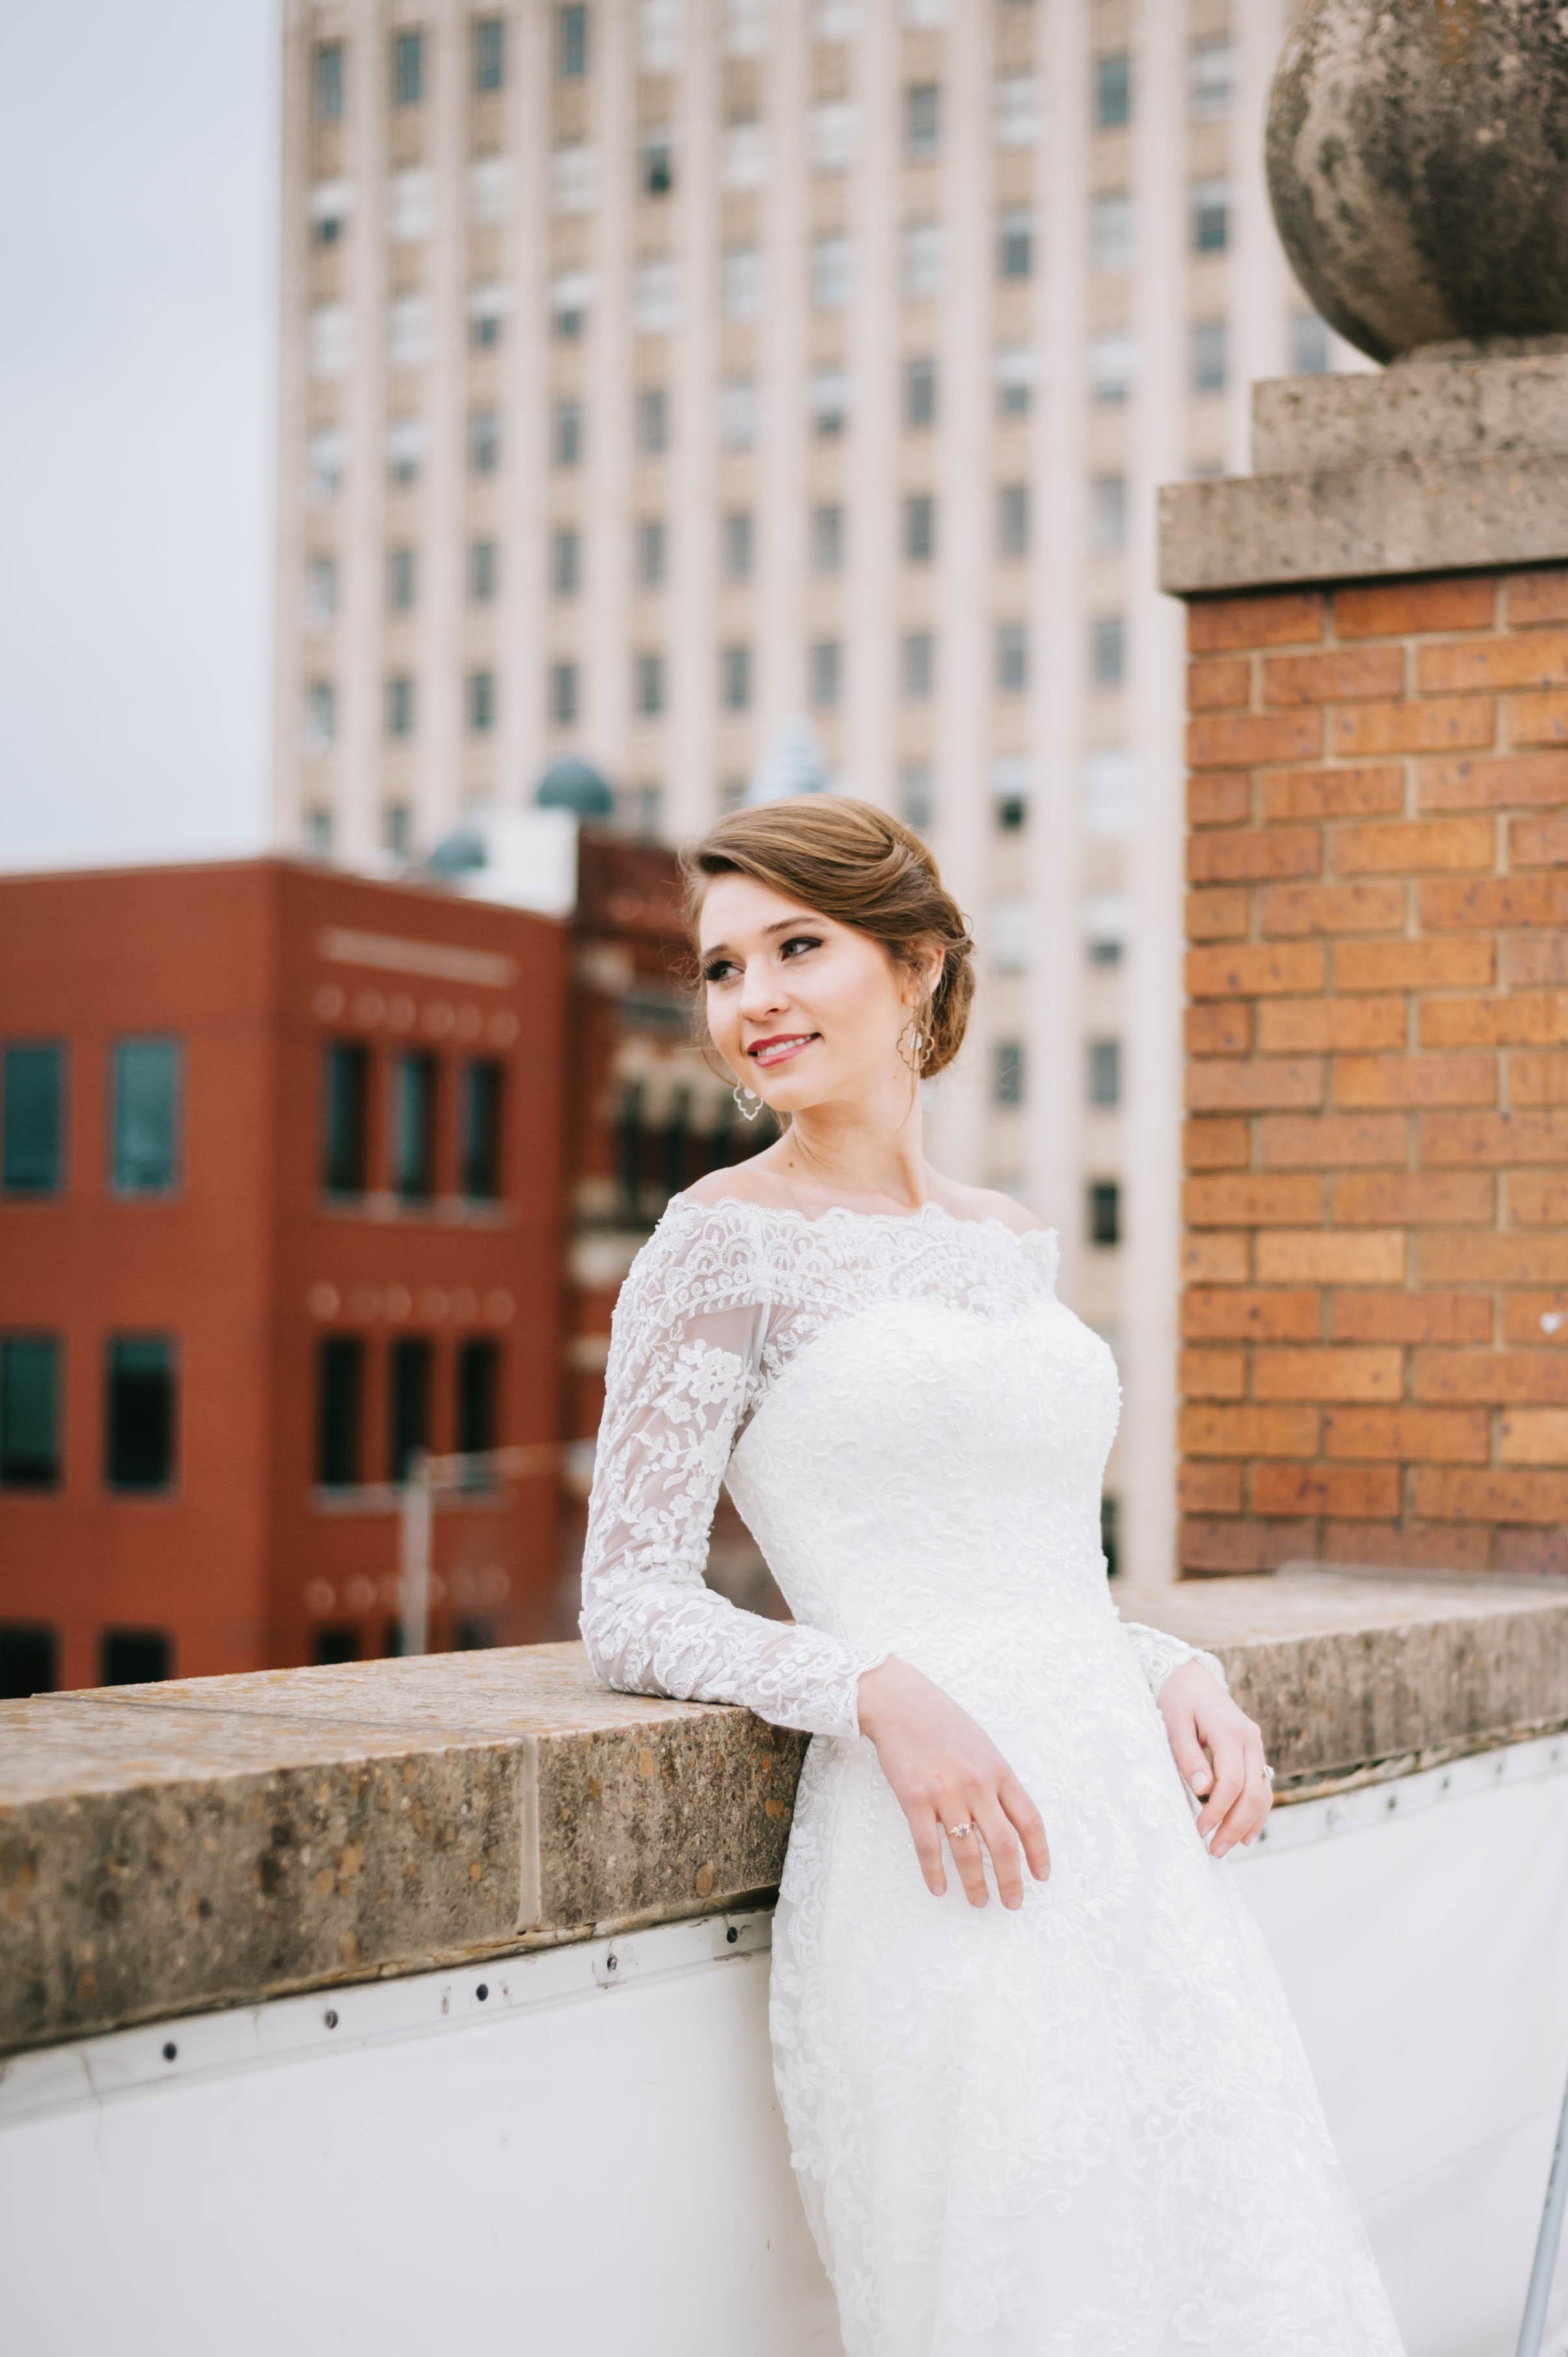 Hannah Steward Baskin | Bridals (71 of 74).jpg